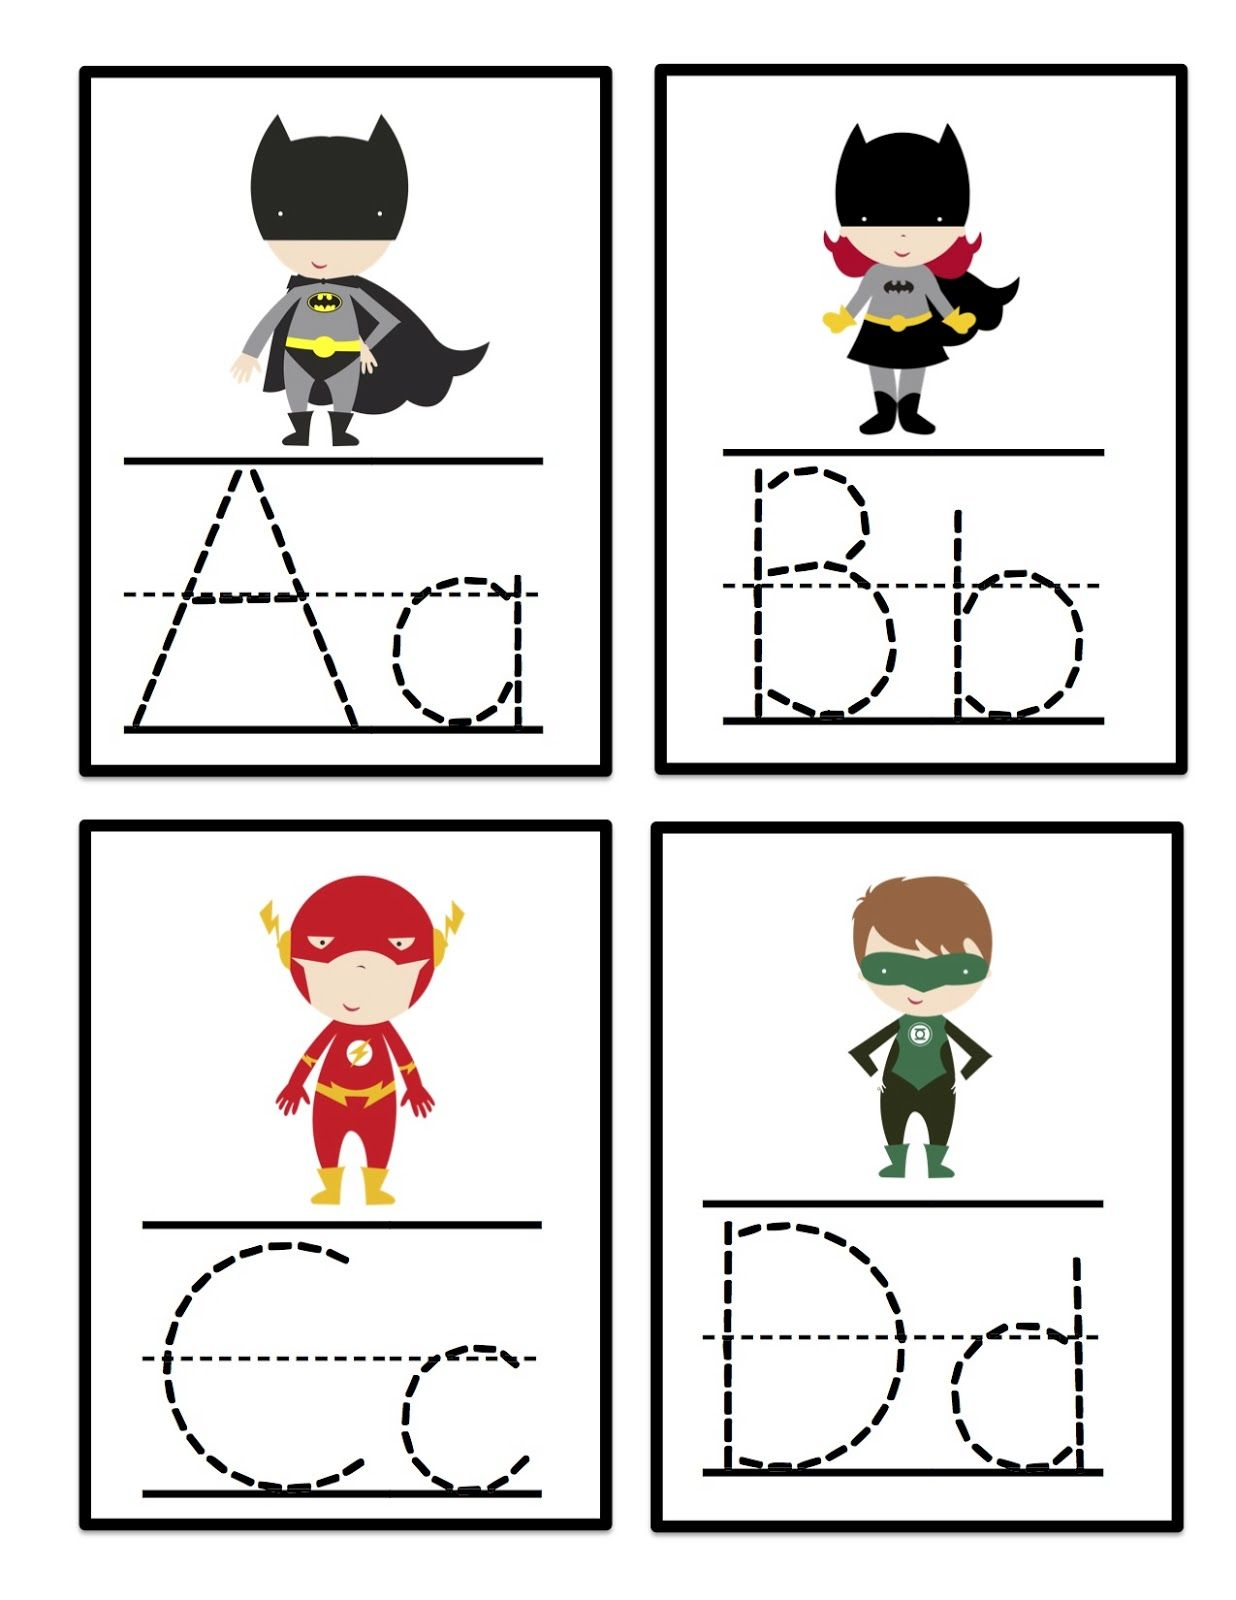 Hero+A-D+template.jpg 1 [ 1600 x 1236 Pixel ]